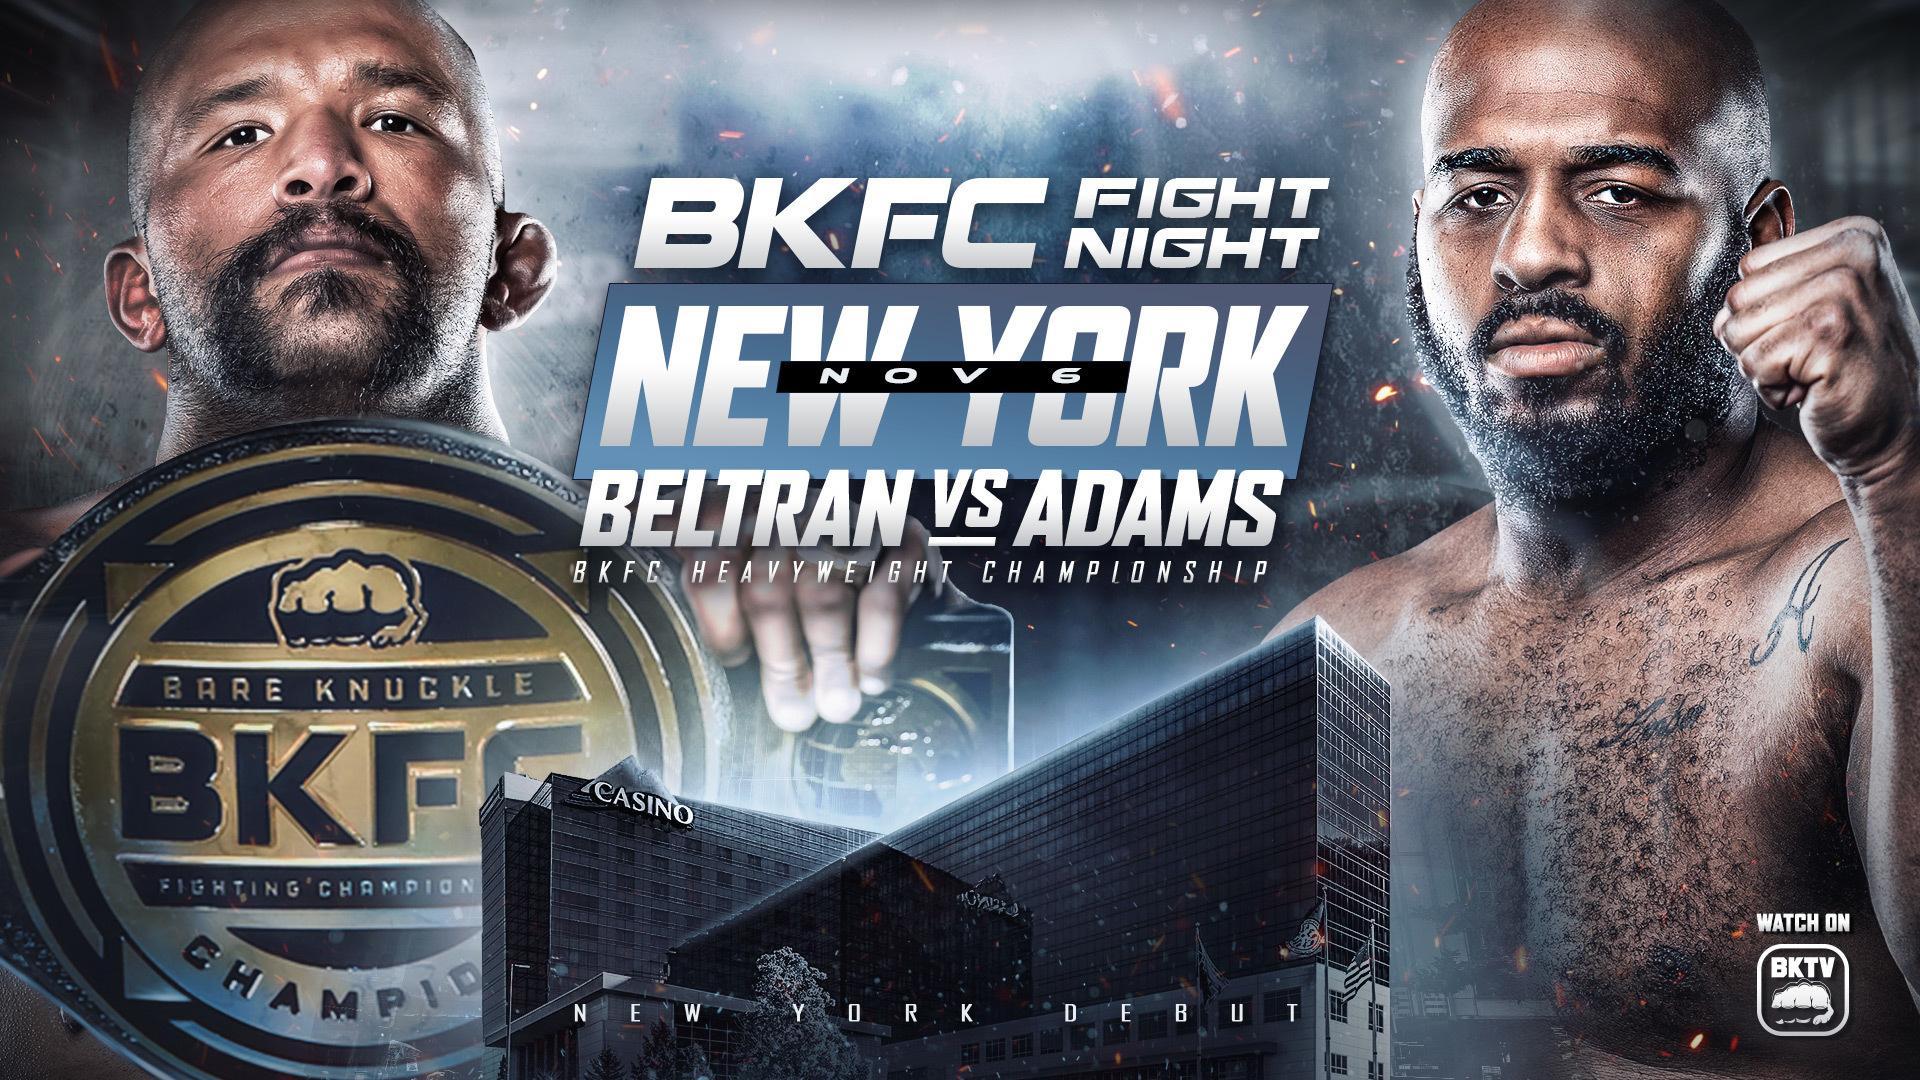 BKFC Fight Night Beltran vs Adams Preview